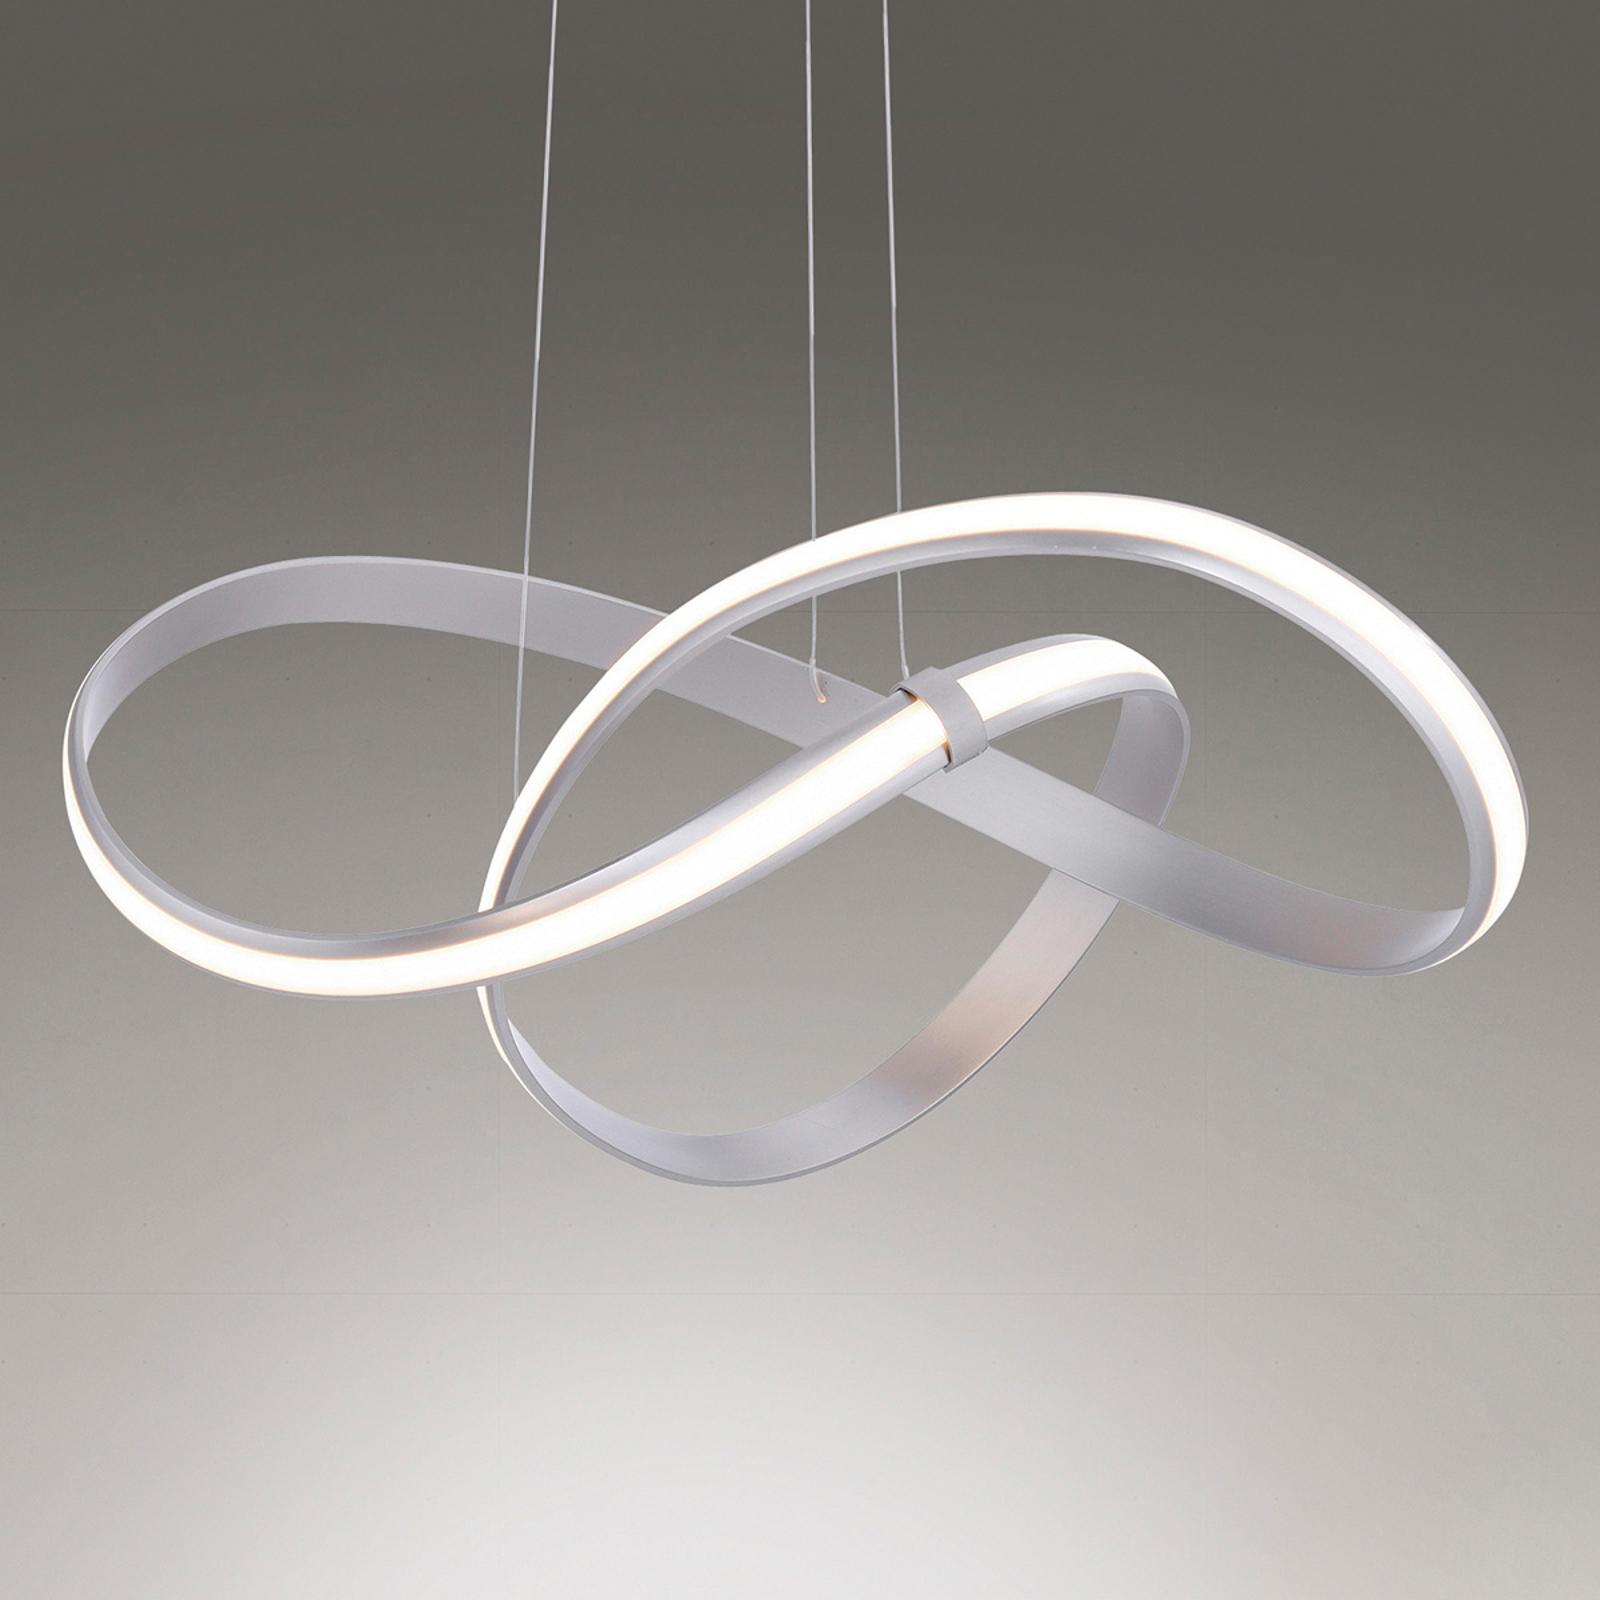 Suspension LED Melinda, 30W, dimmable, gris acier